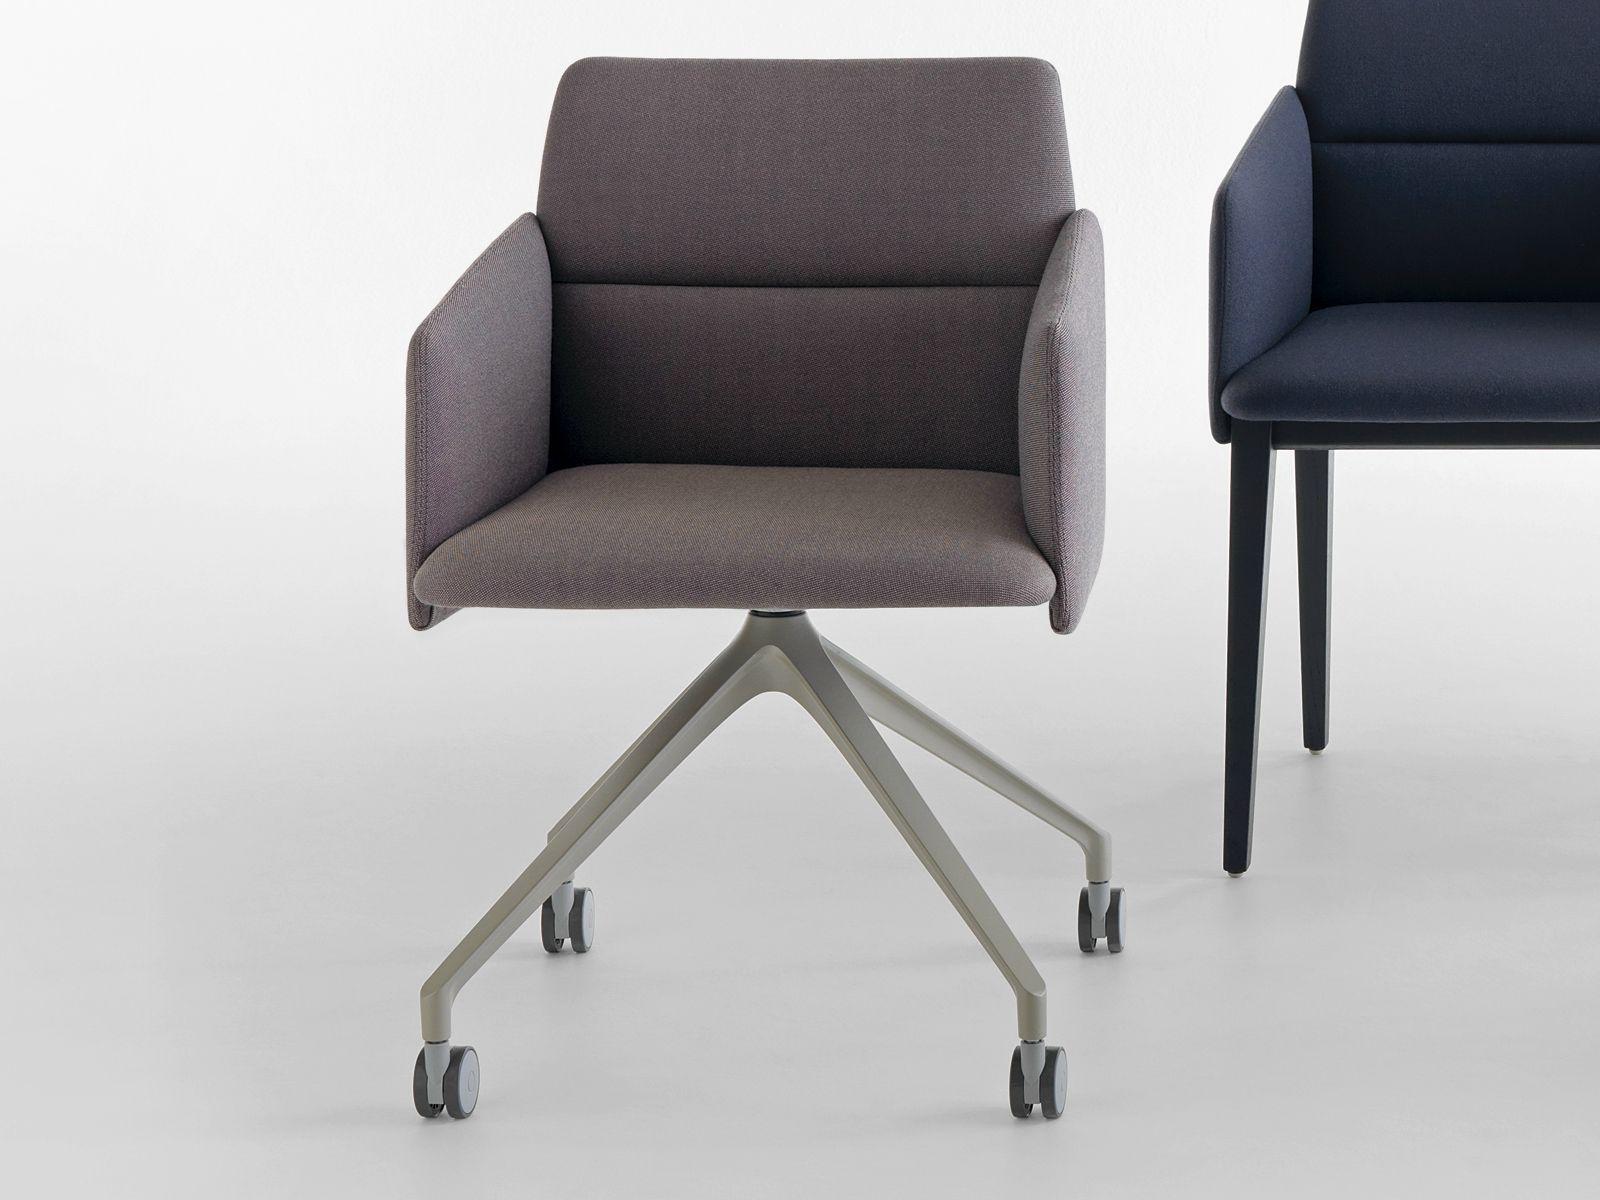 AURA Chair With Casters By Crassevig Design Mario Ferrarini